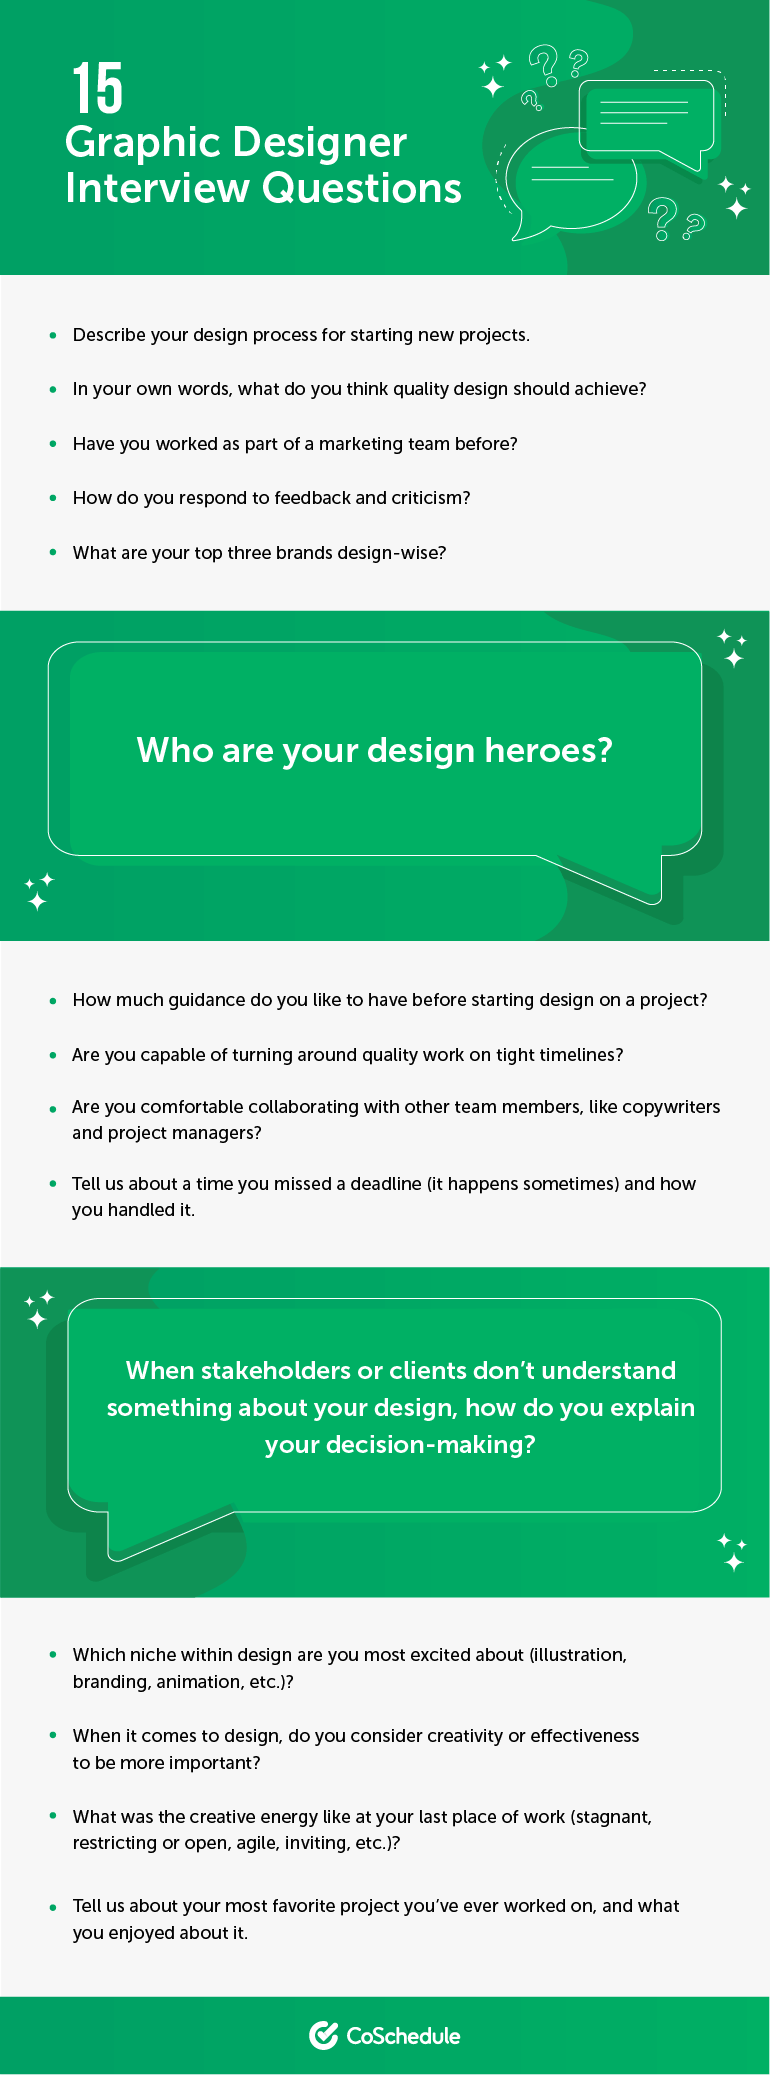 15 Graphic Designer Interview Questions